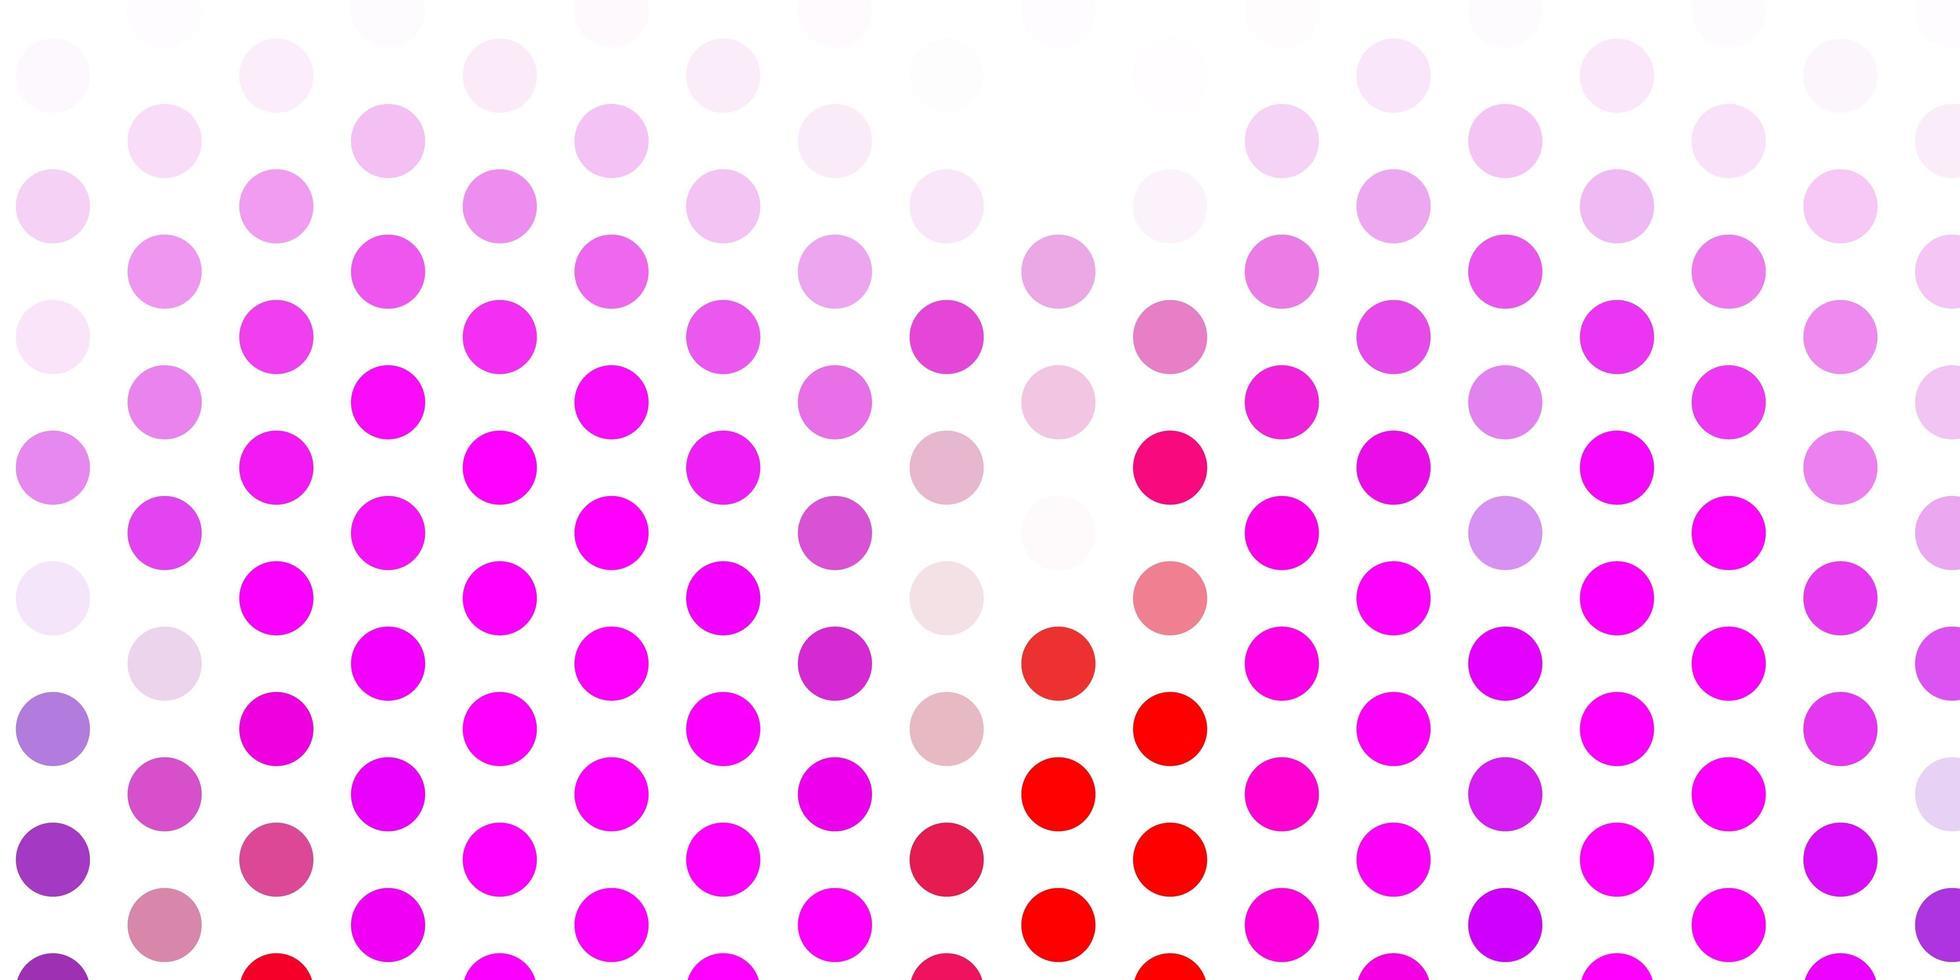 Fondo de vector rosa claro, rojo con manchas.